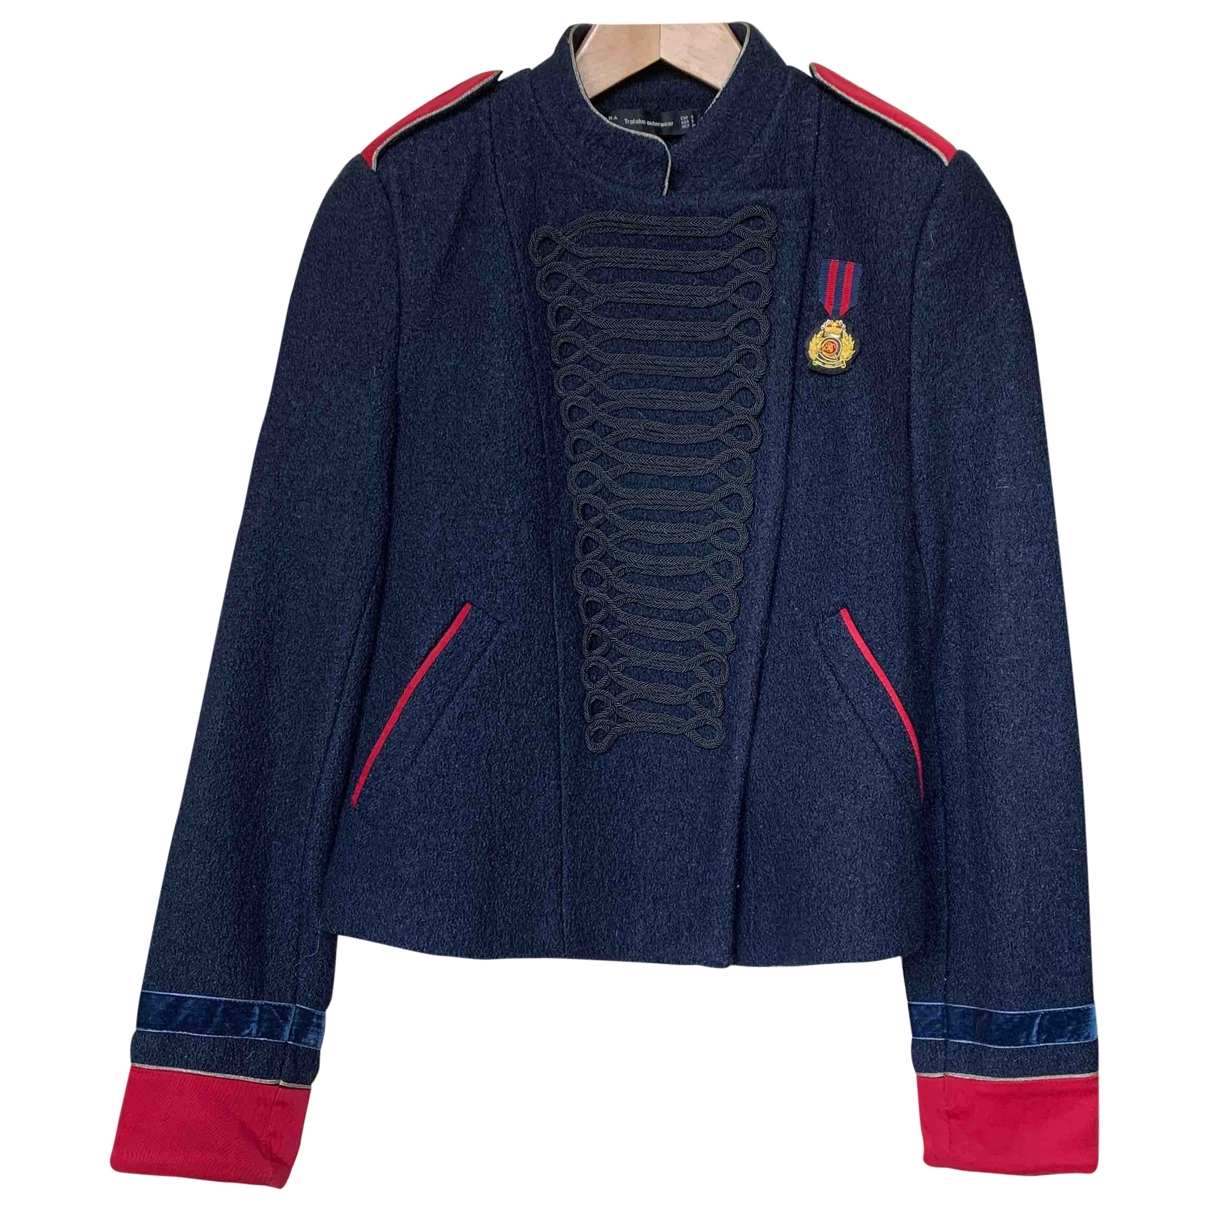 Zara \N Jacke in  Blau Wolle